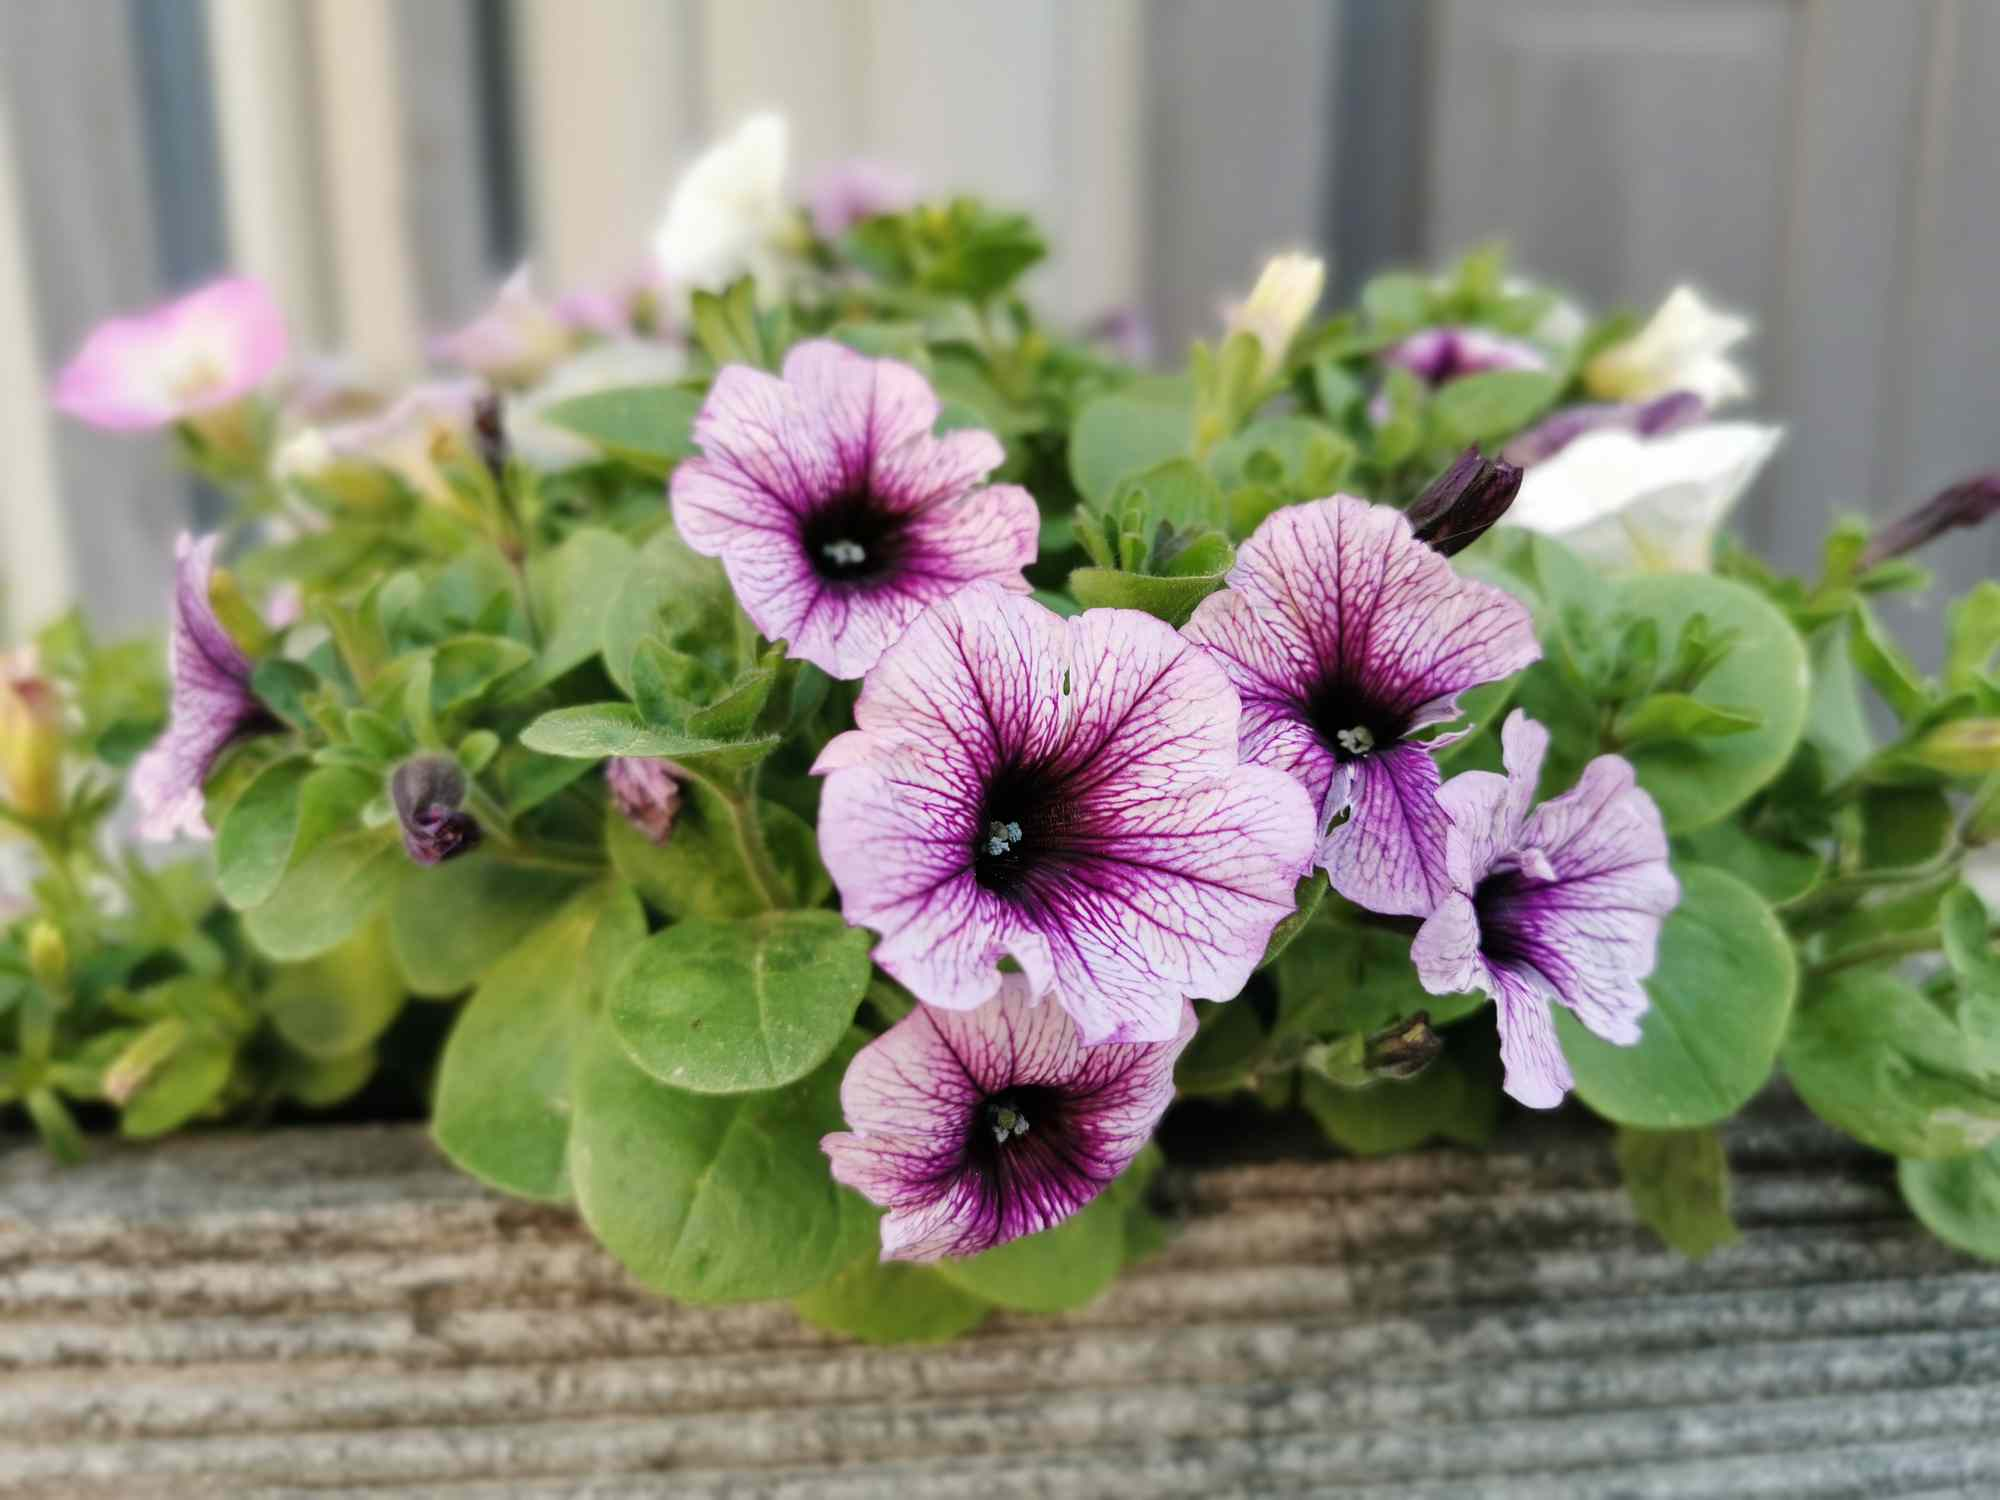 Petunia flowers in window box